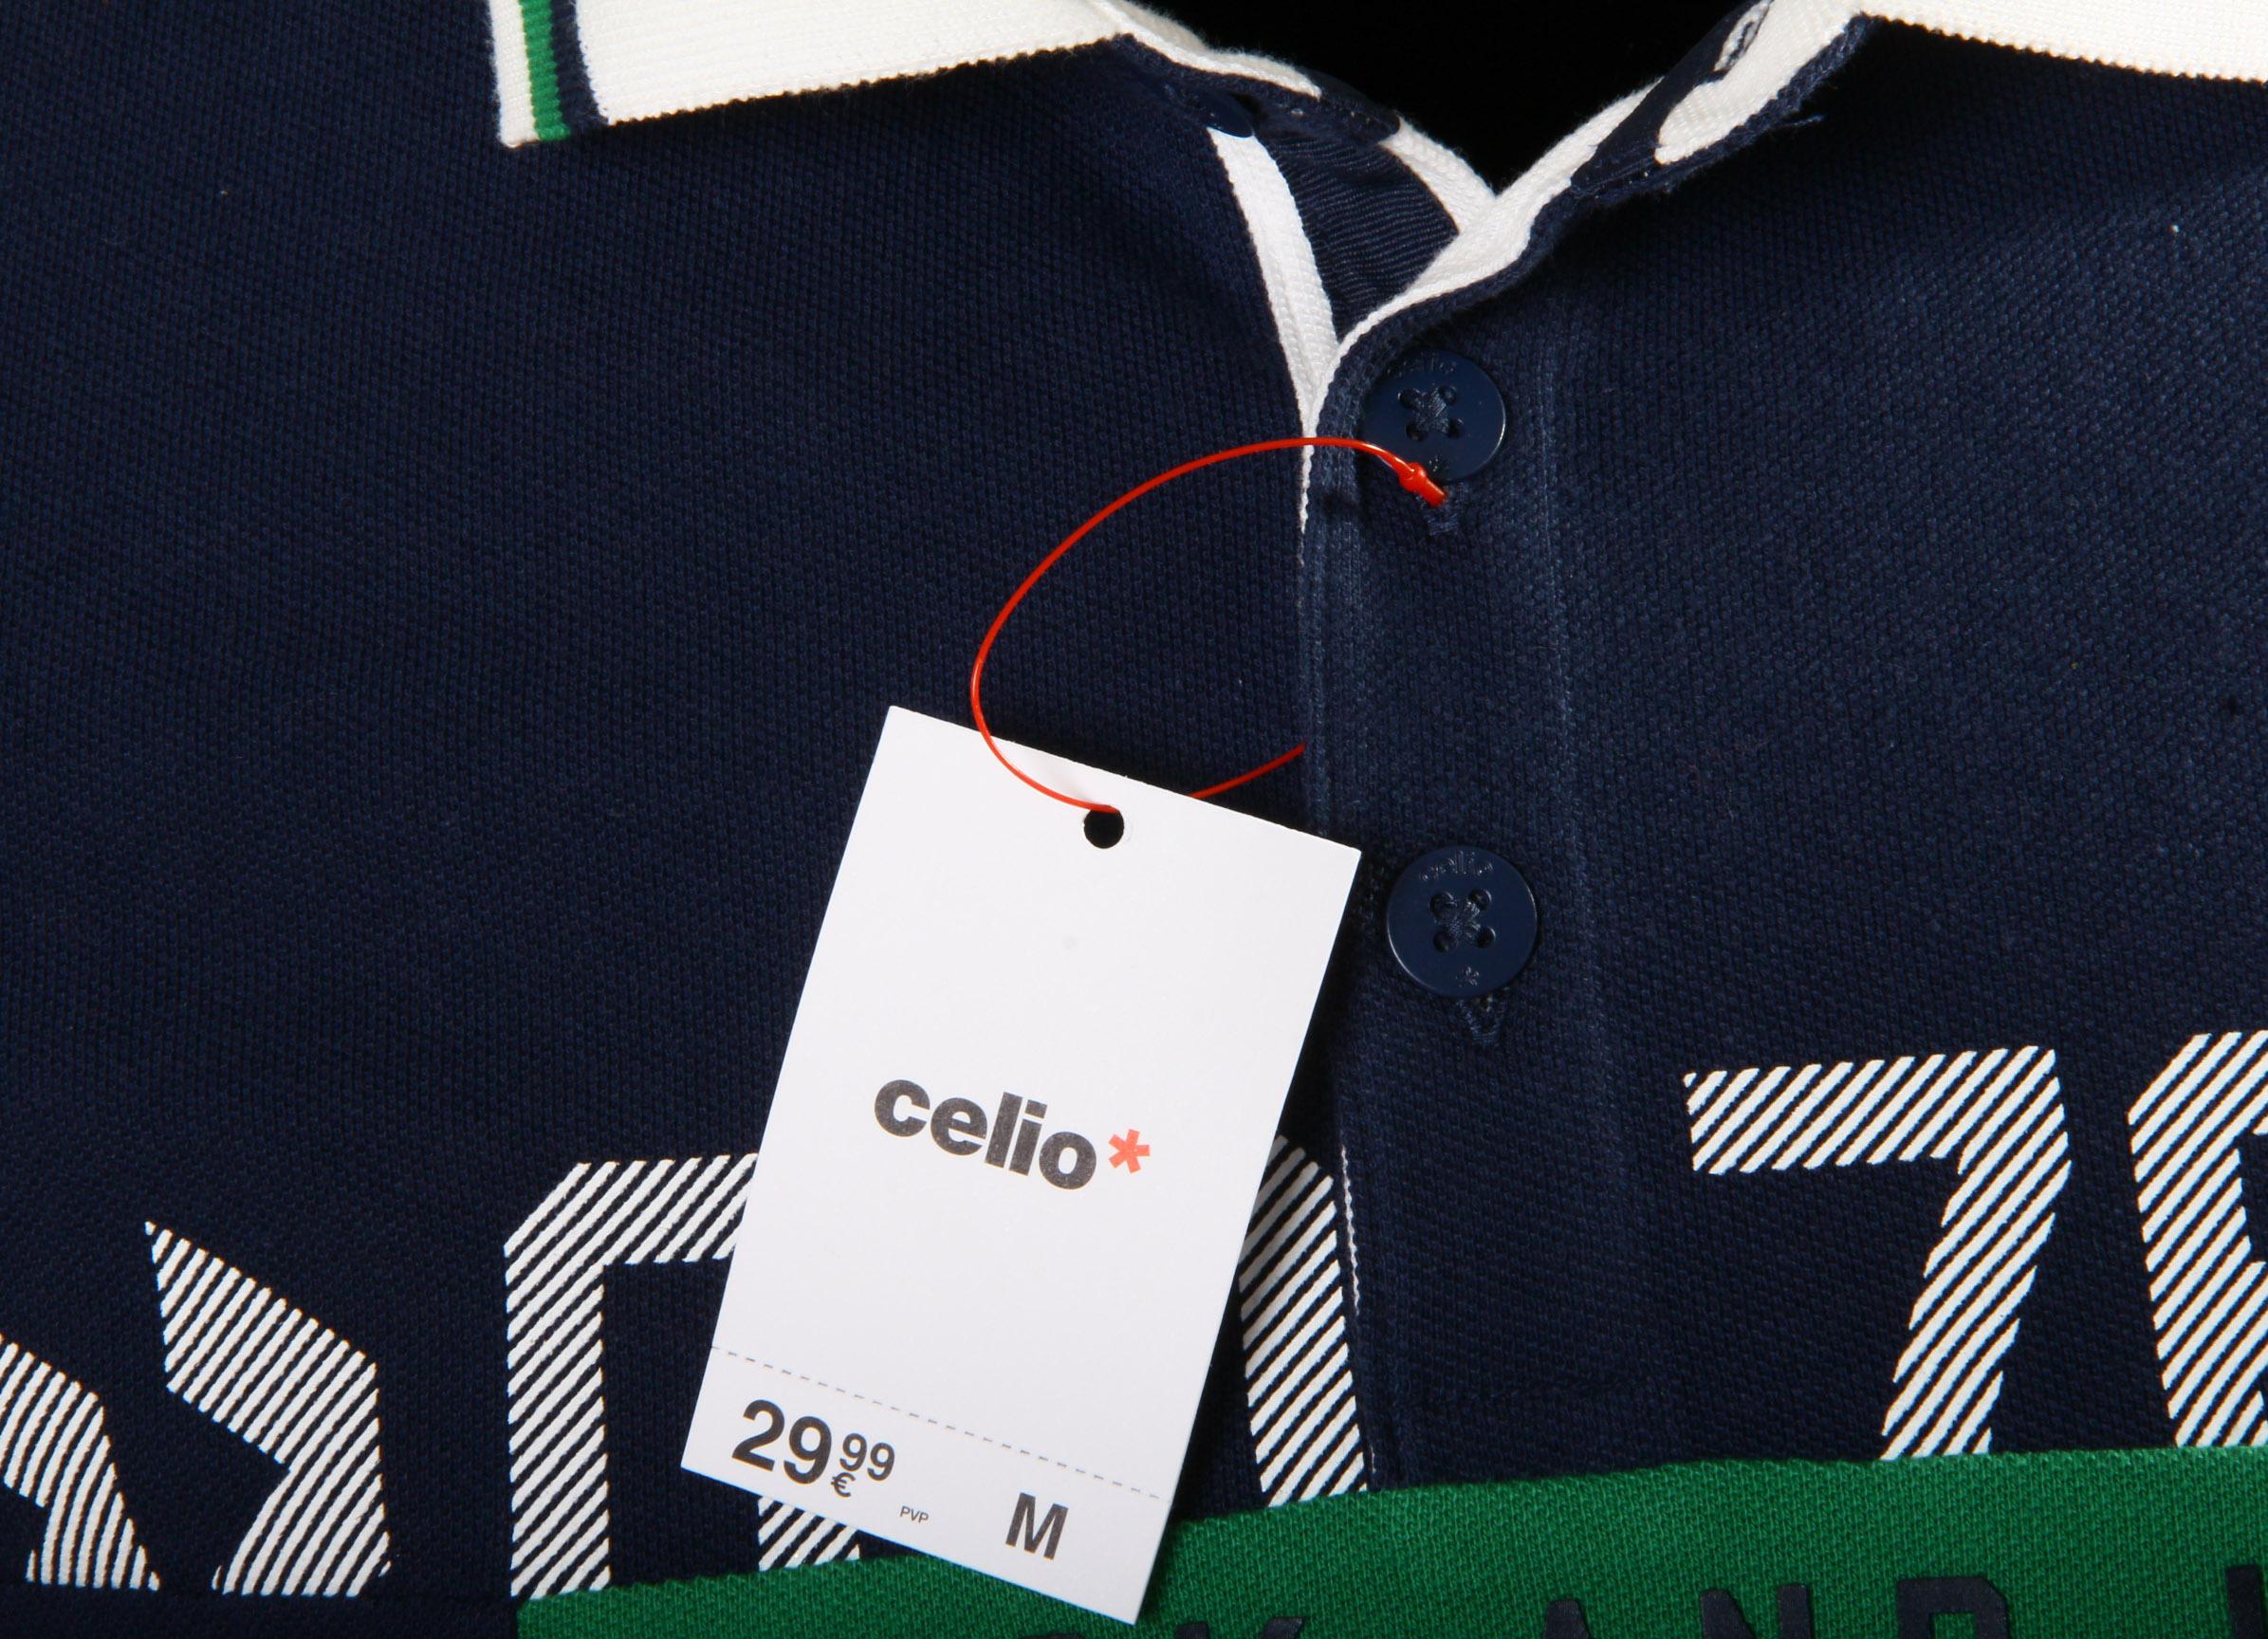 Shop Phan_3t Hàng VNXK origianal !!Zara,celio,nautica,raul lauren...Giá tốt nhất!! - 24